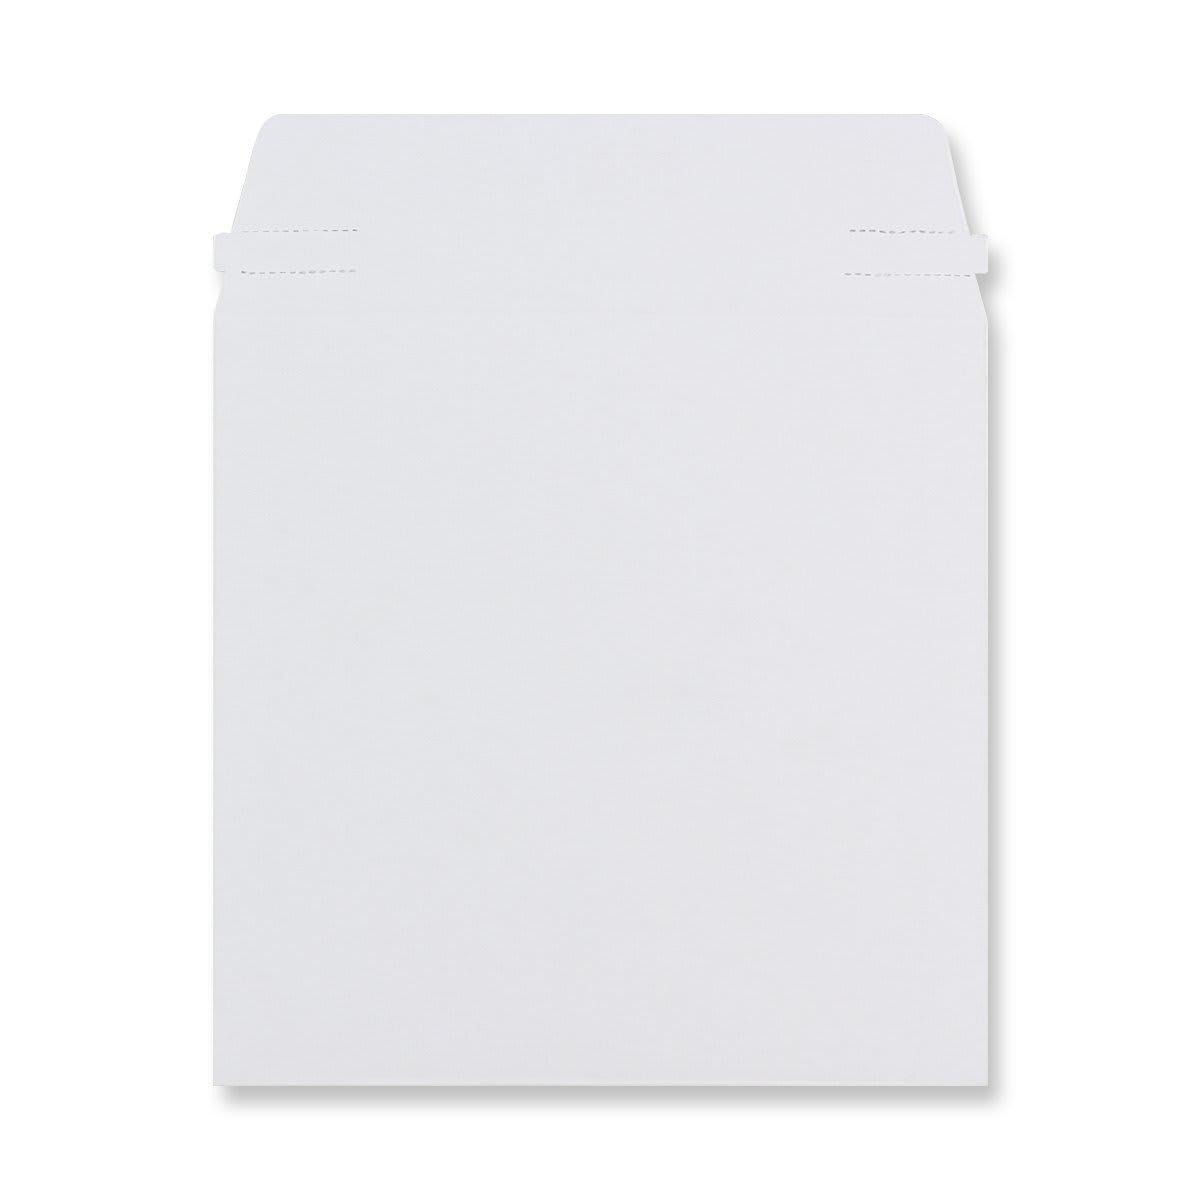 164 x 164mm WHITE ALL BOARD ENVELOPES